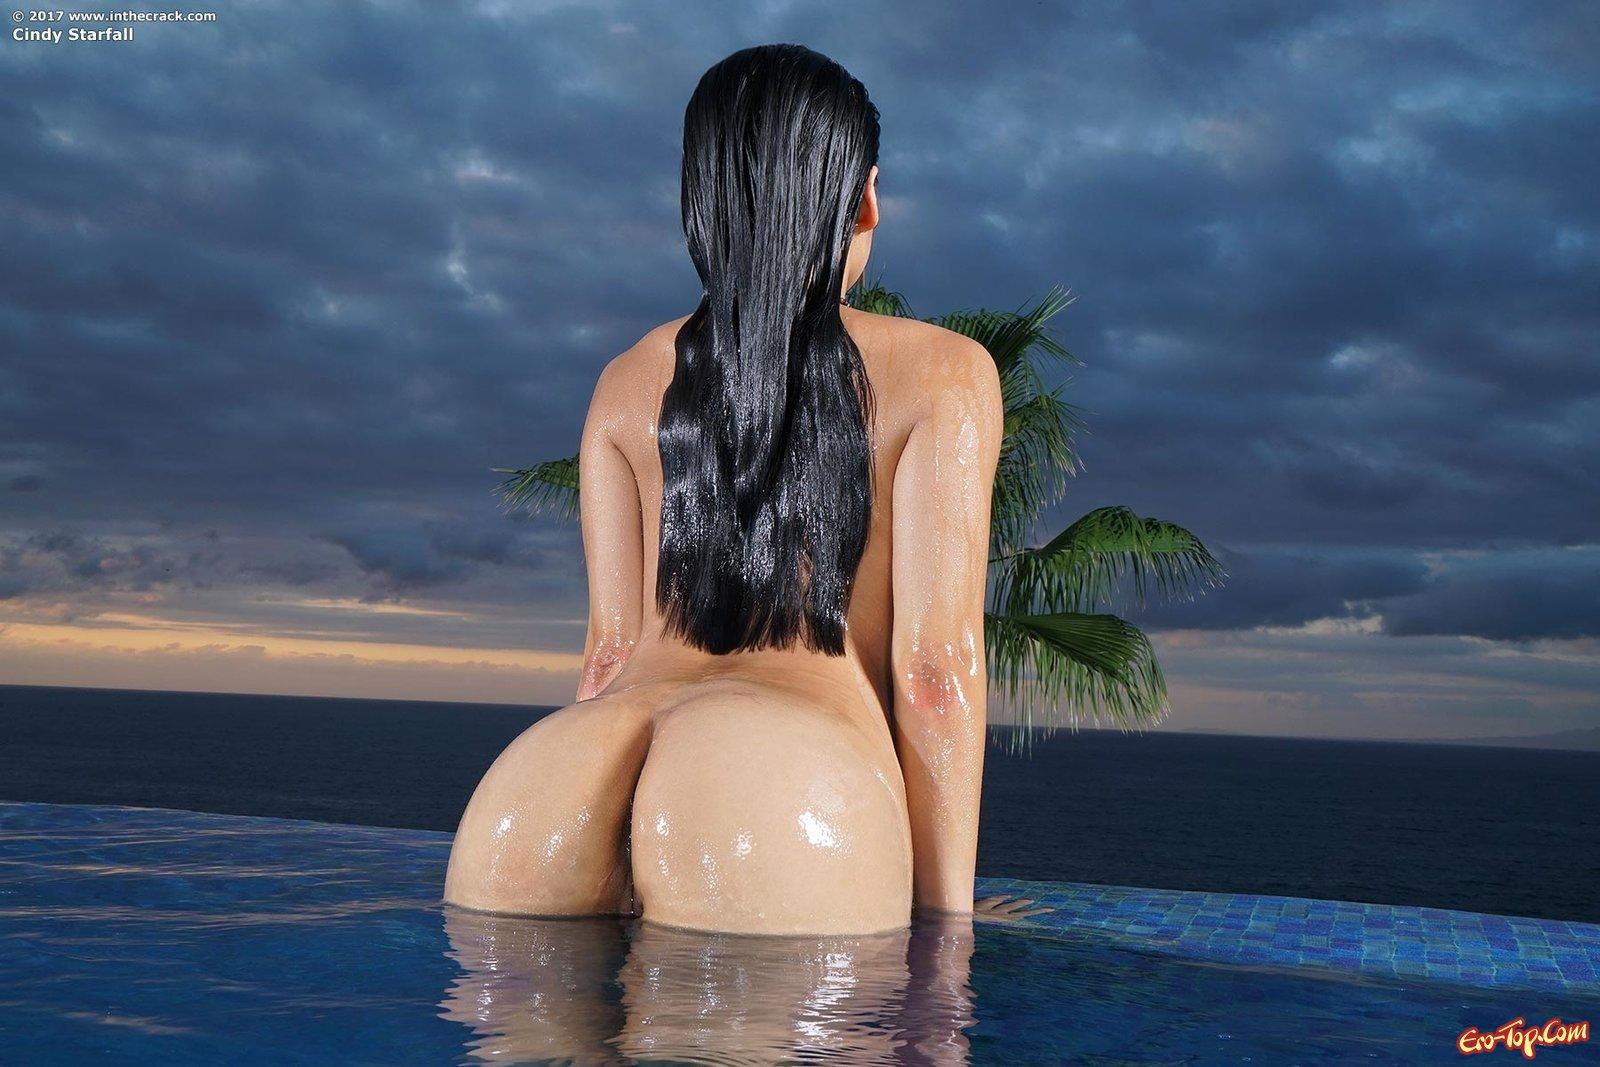 Китаянка показала киску и задницу возле бассейна